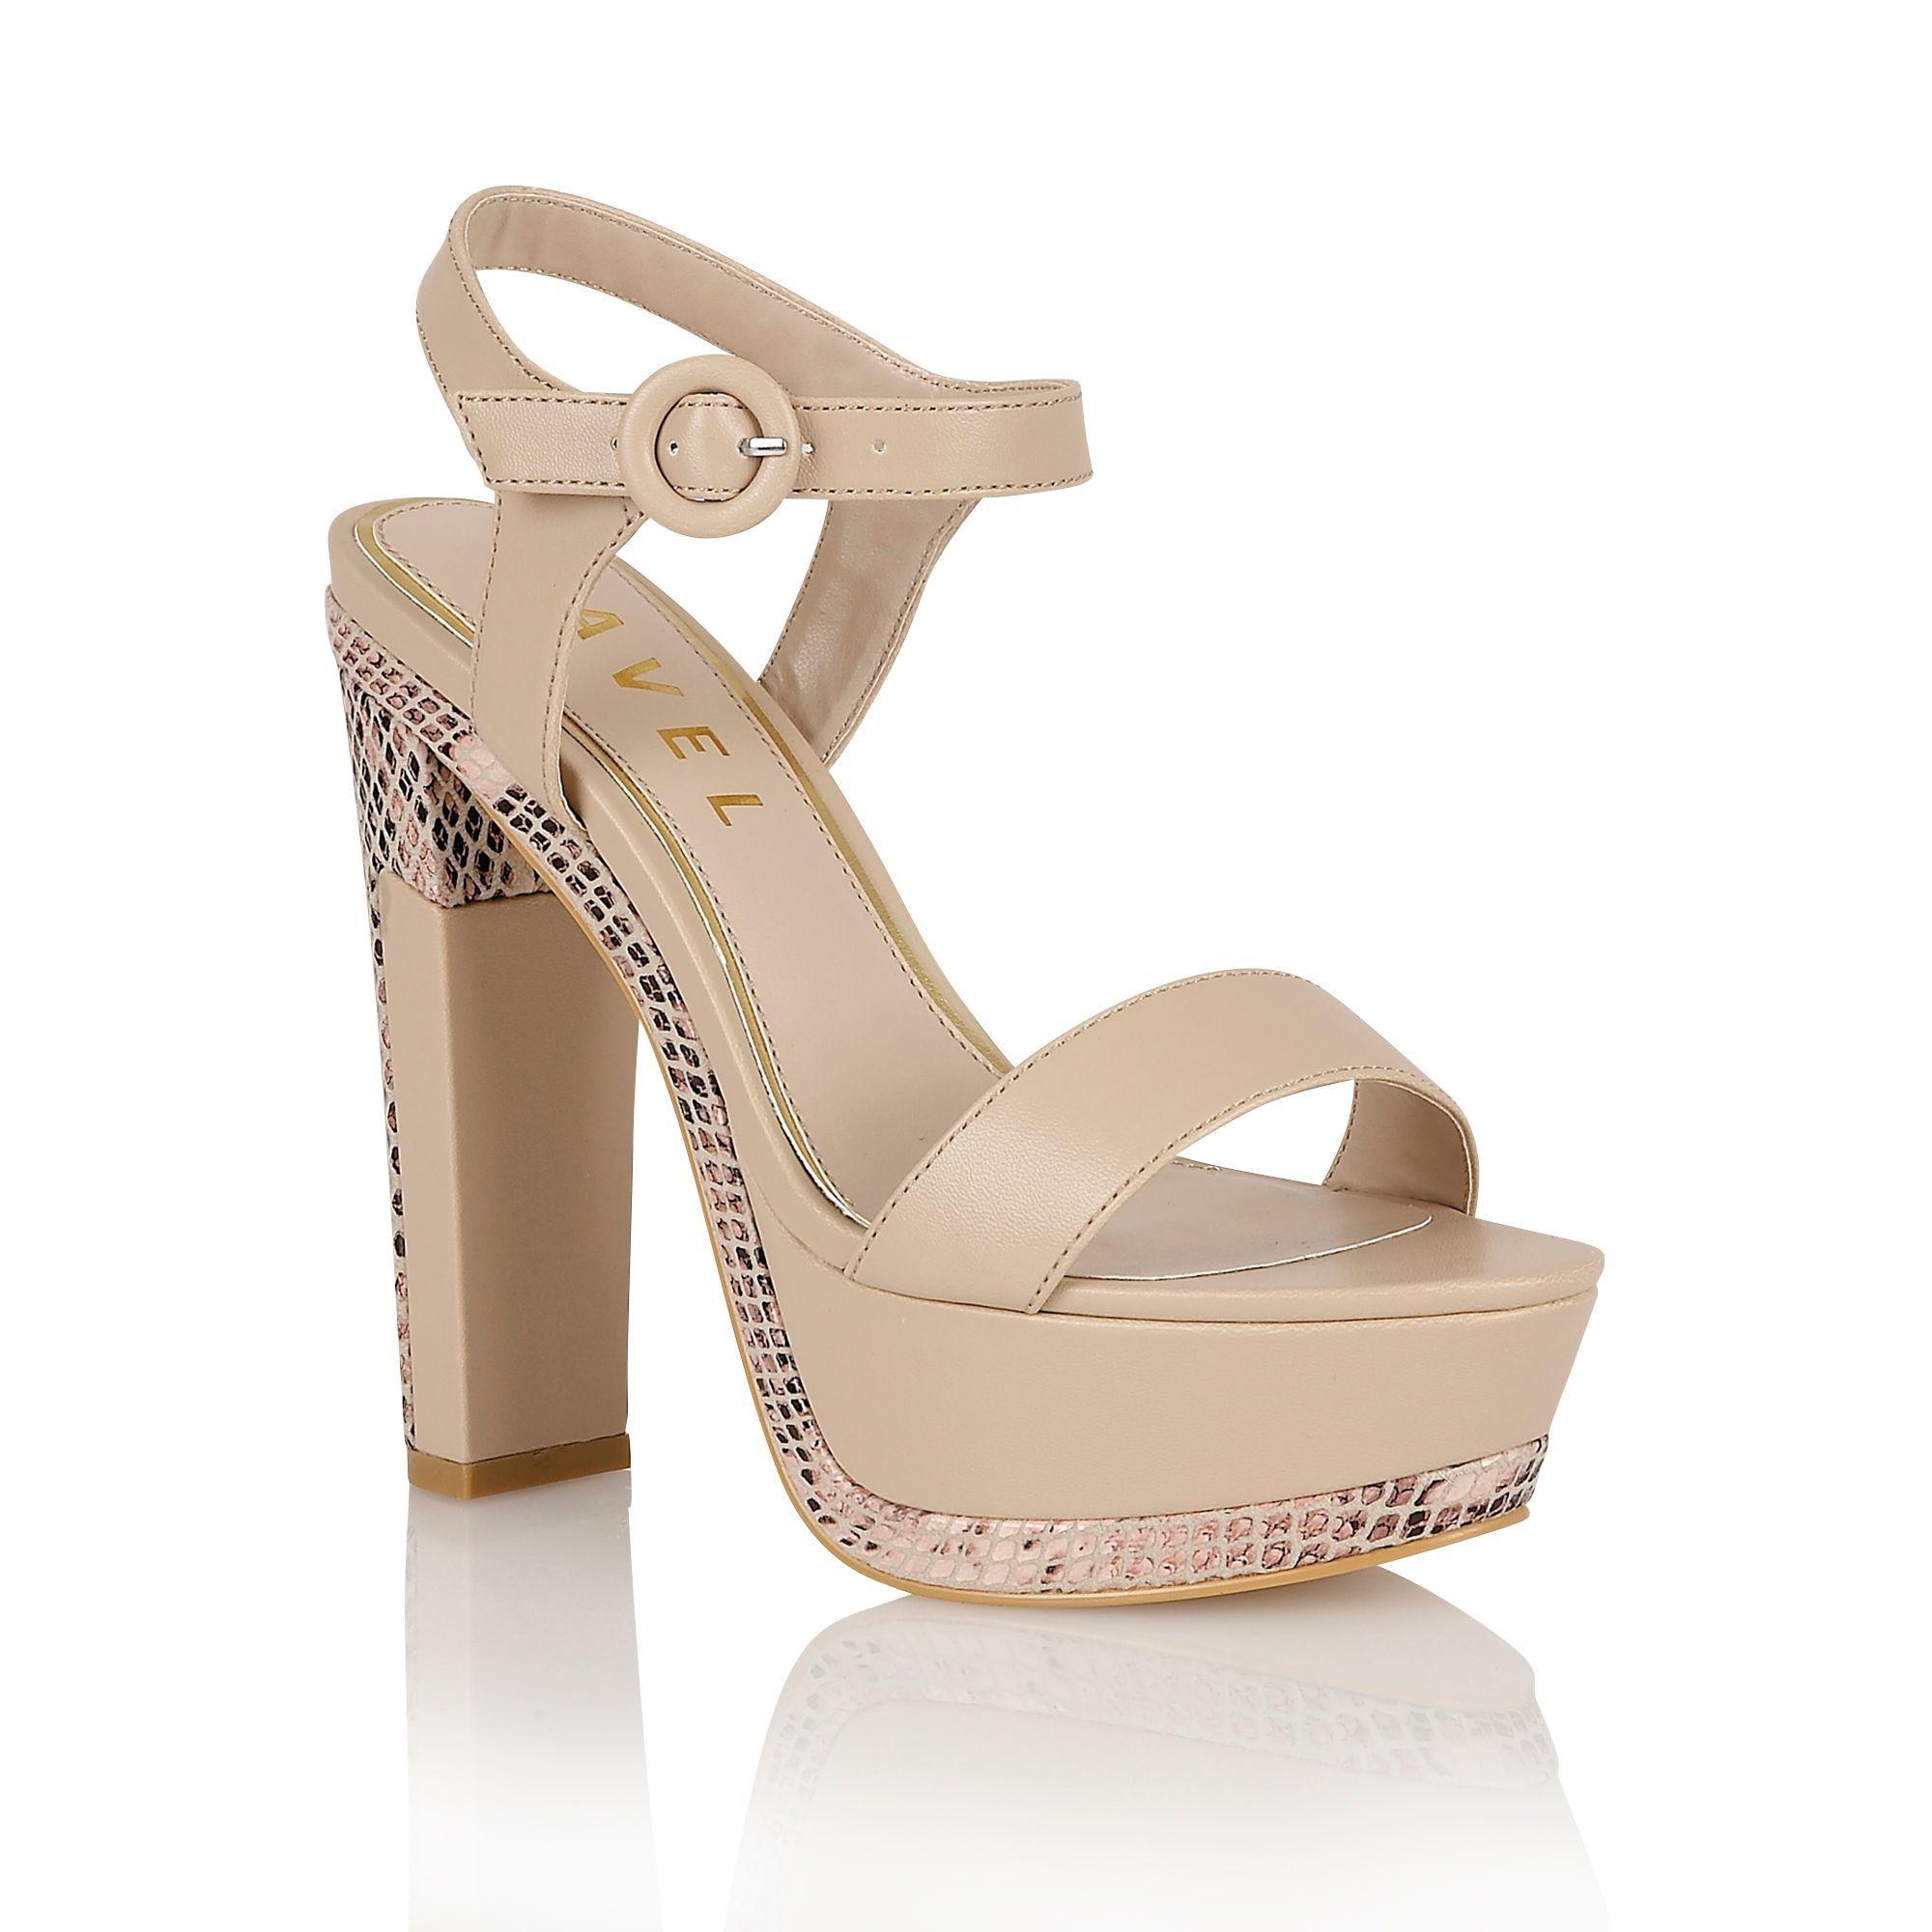 Ravel Sacramento ladies platform sandals, Nude